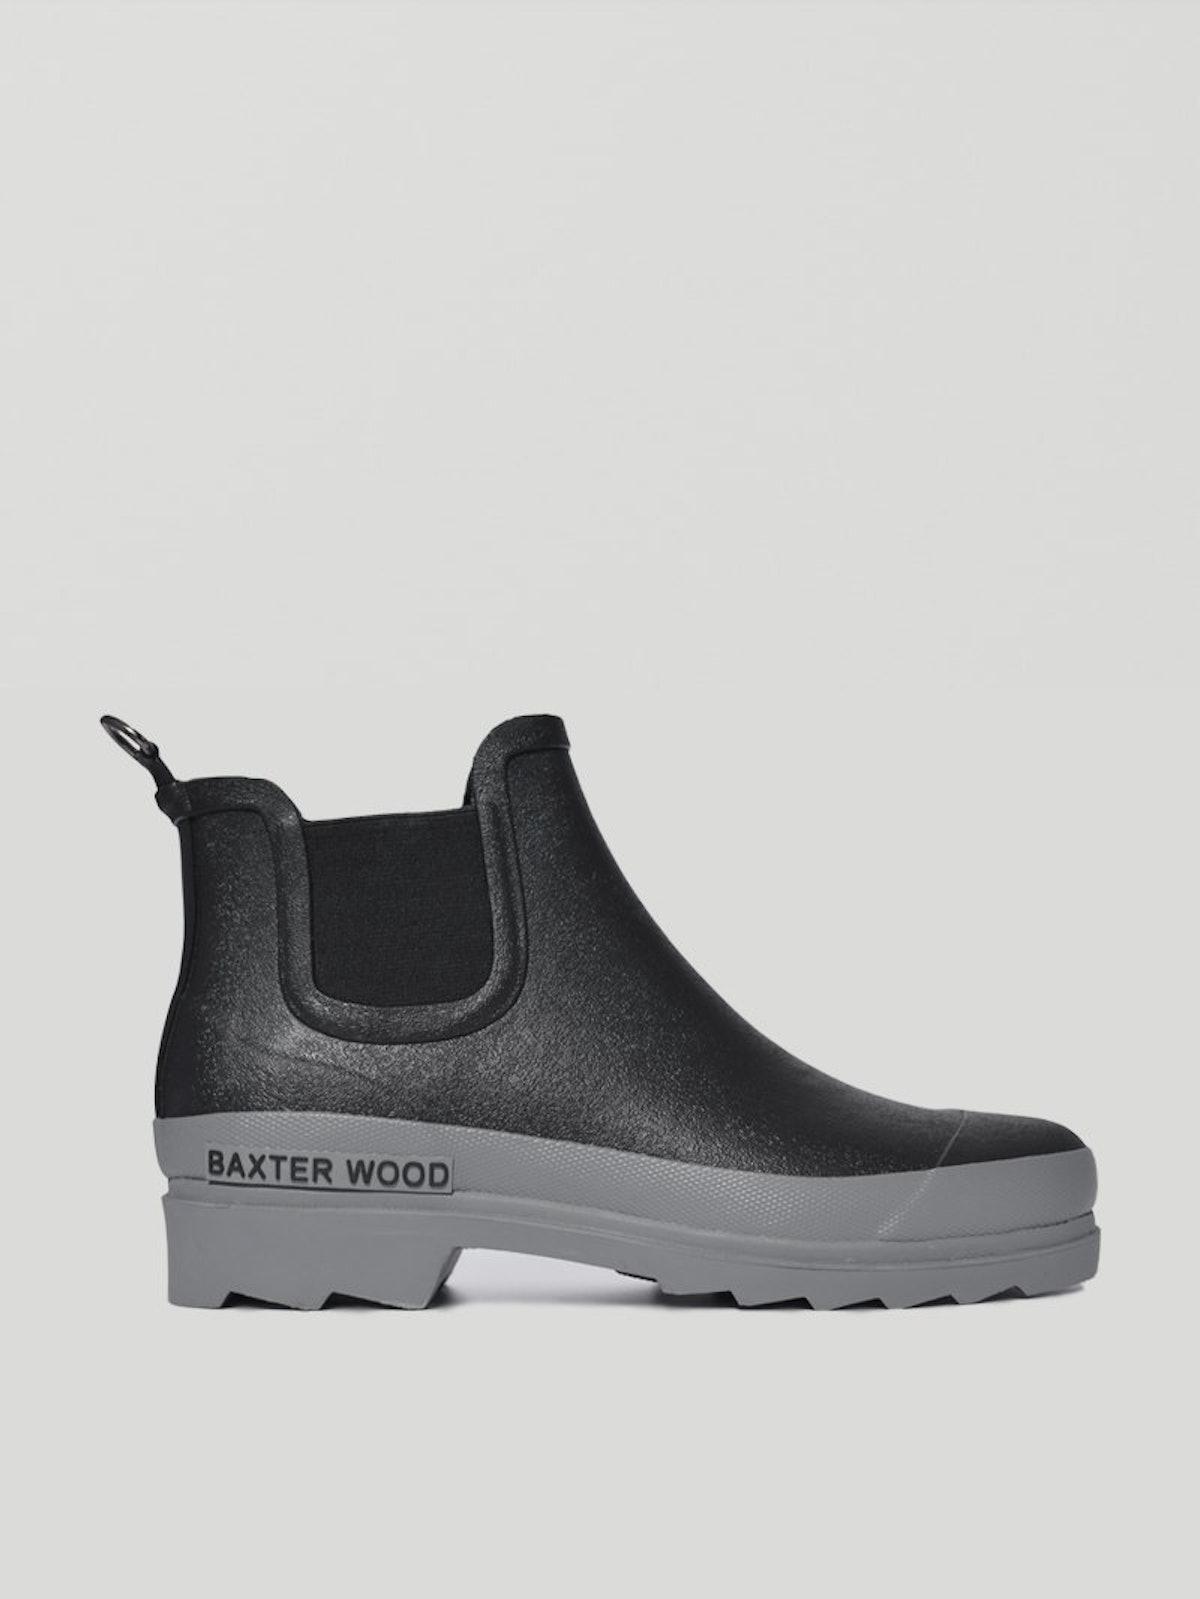 Baxter Wood Grey Sole Hevea Chelsea Boots